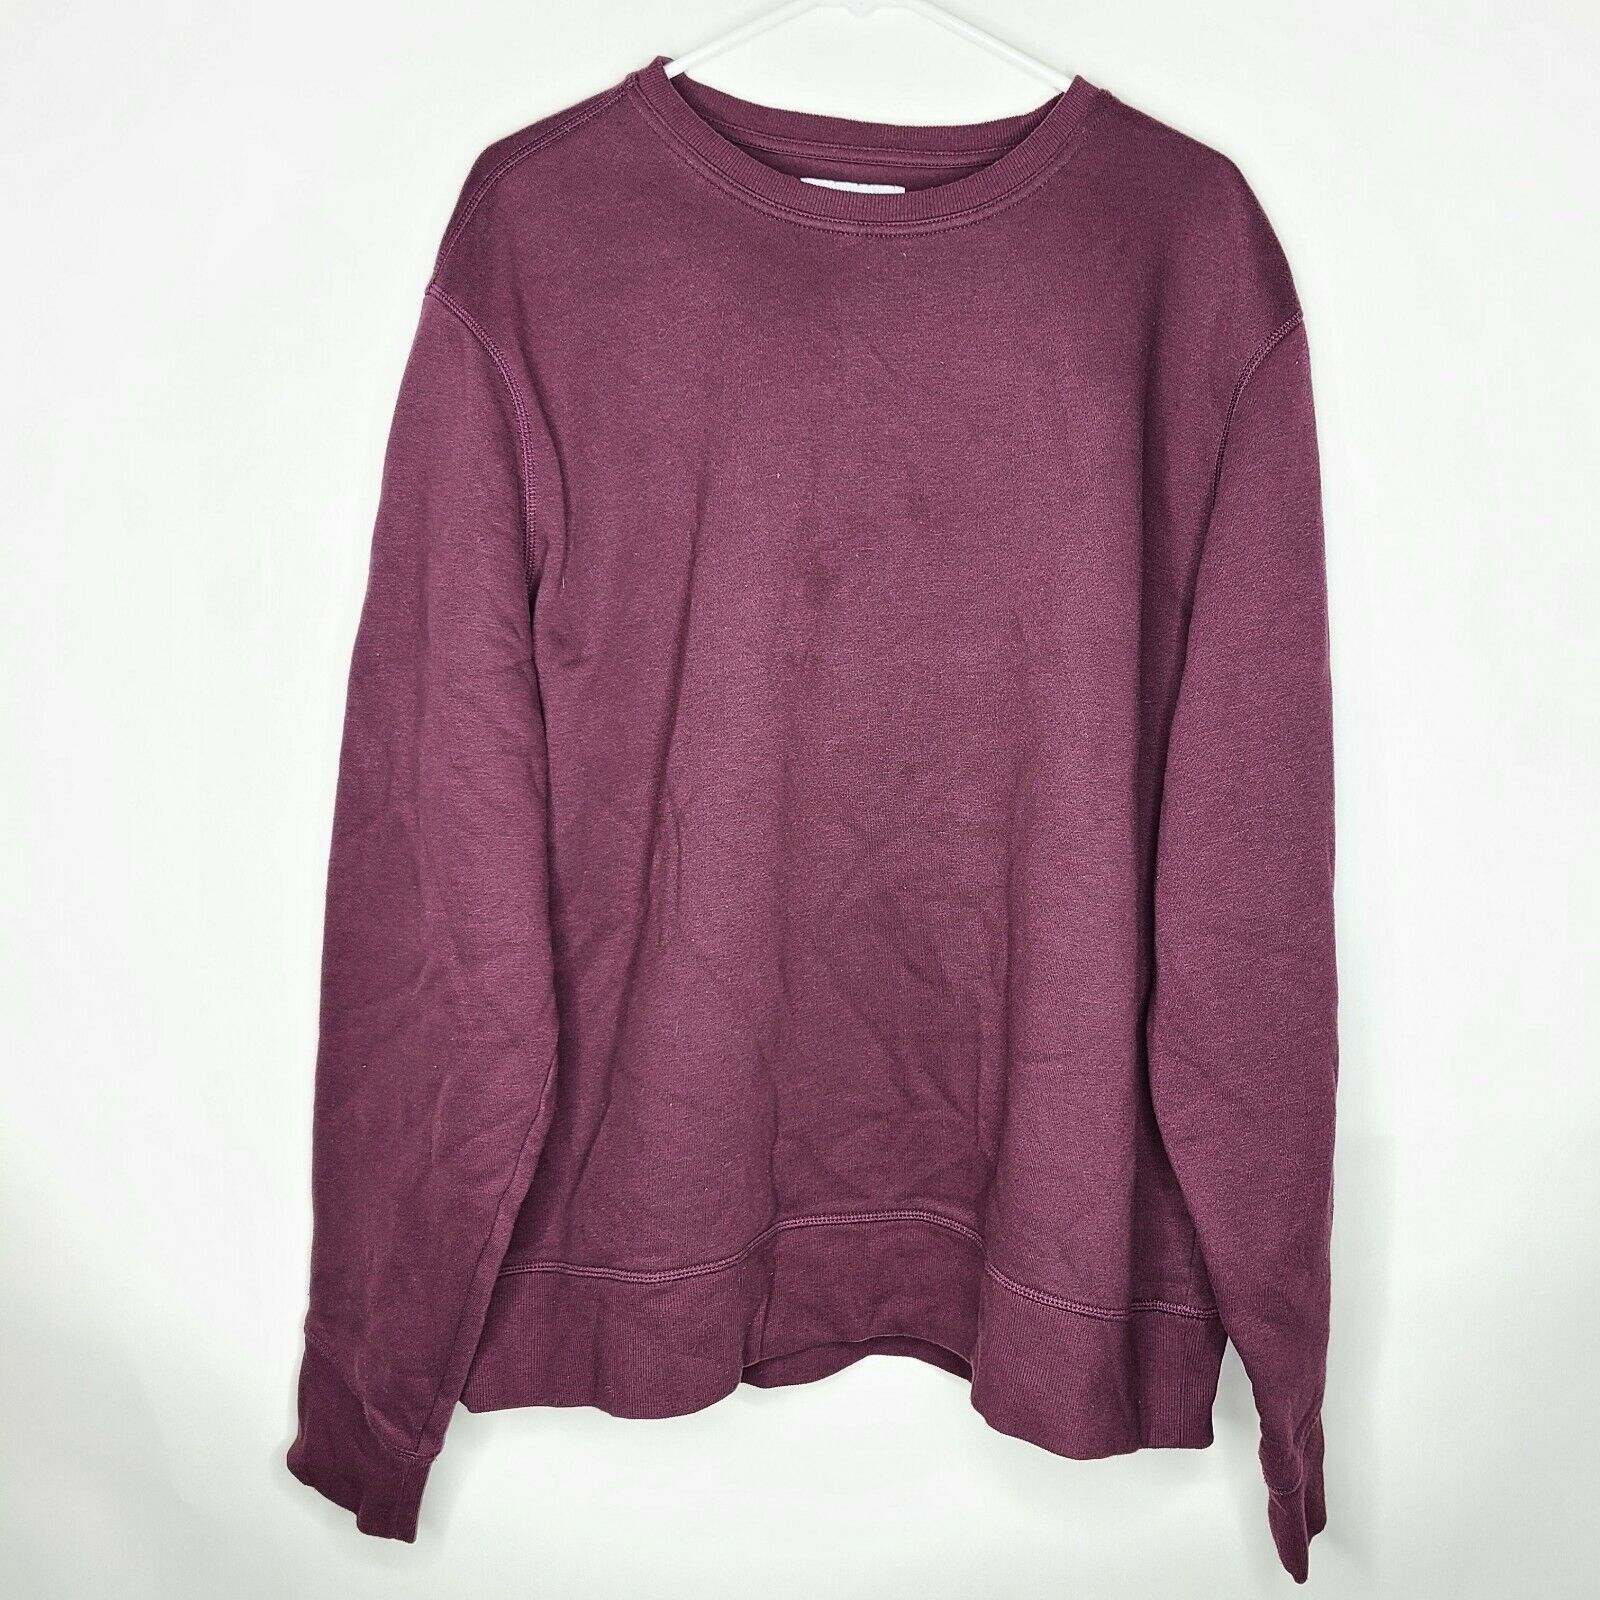 Amazon Essentials Purple Pullover Crew Neck Long Sleeve Sweatshirt Size 2XL